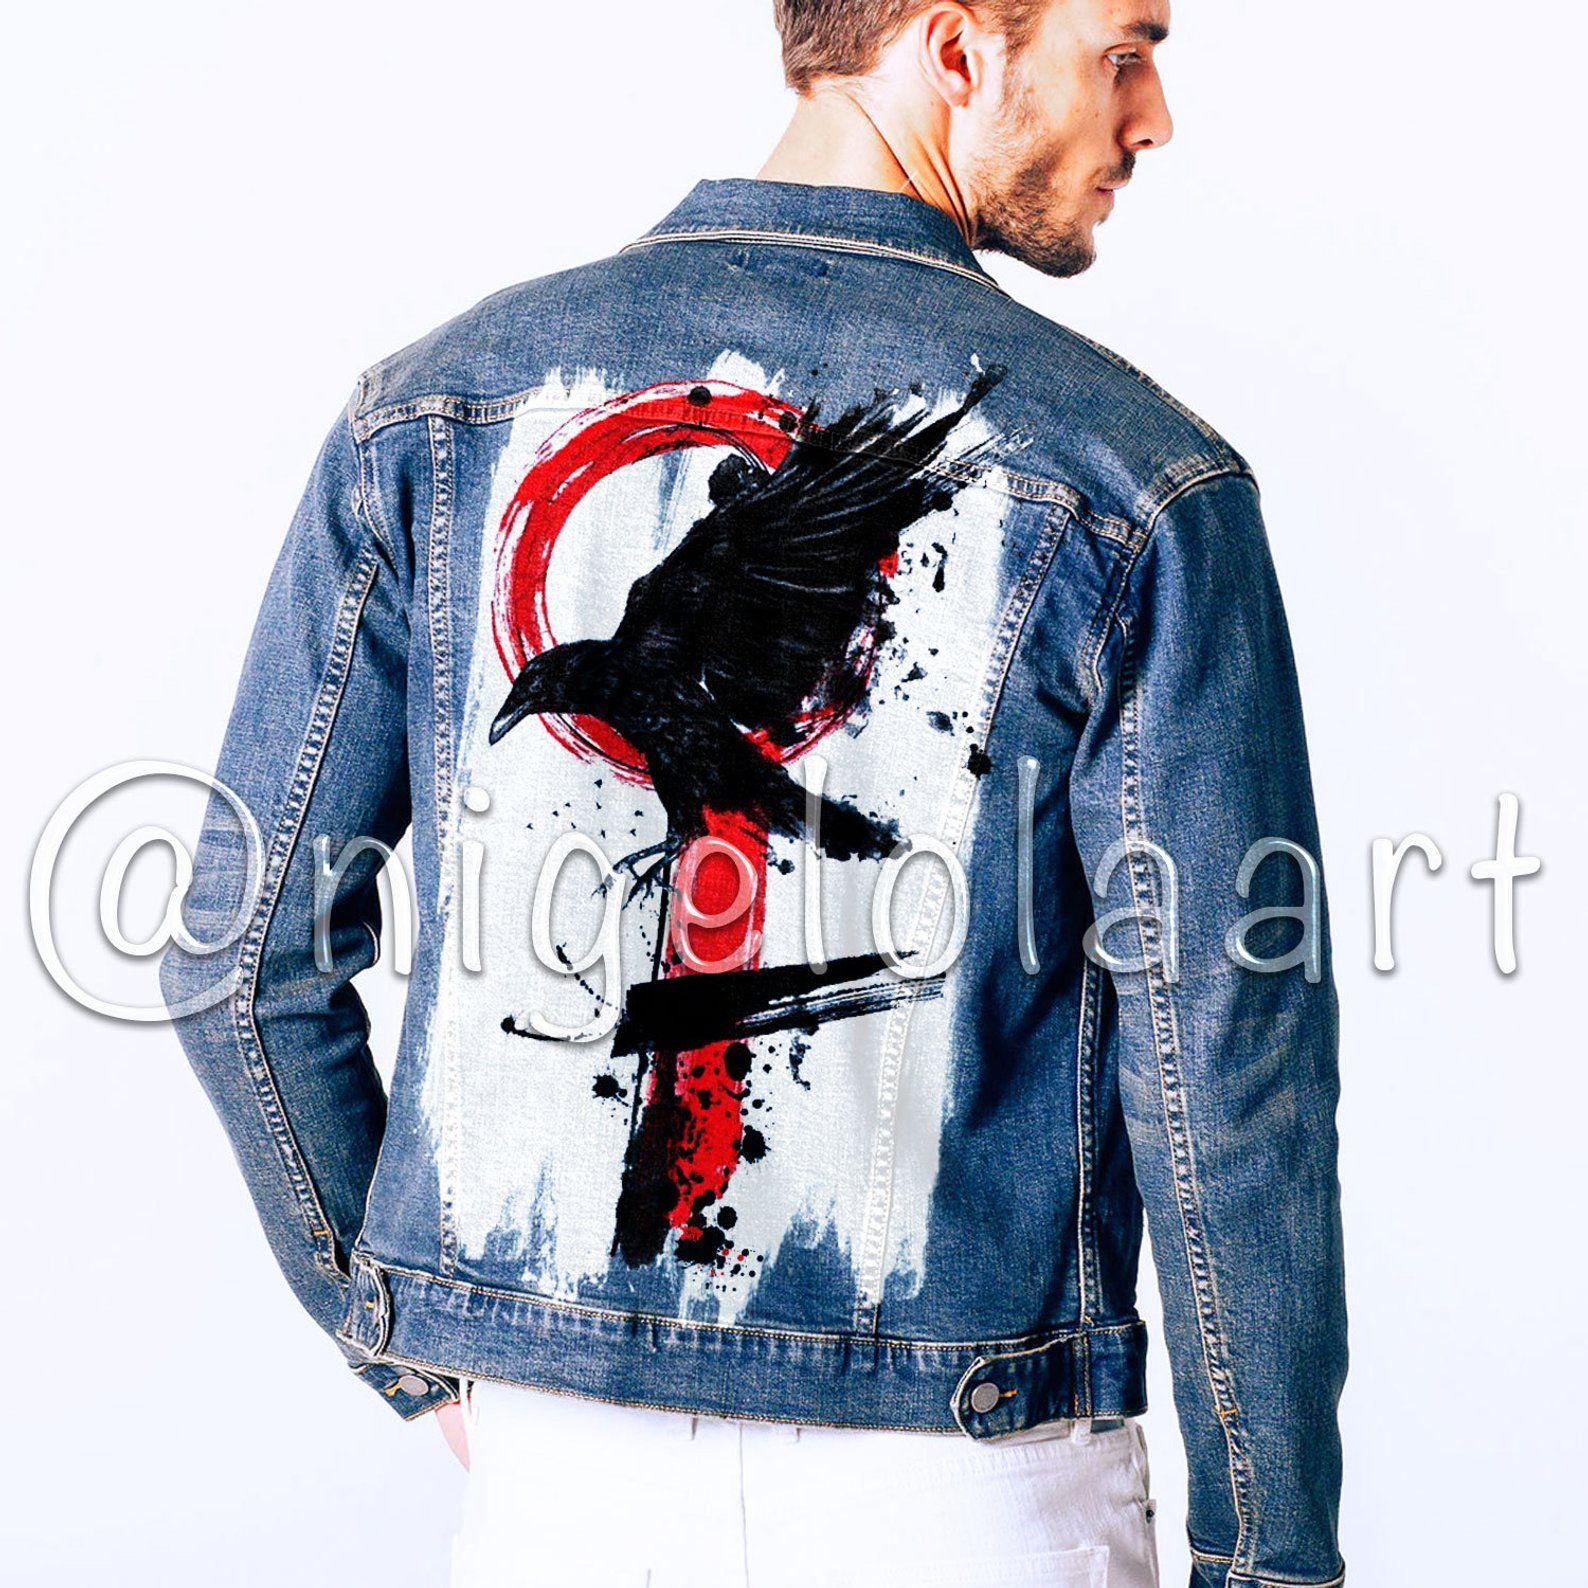 Hand Painted Jacket Black Raven Jean Jacket Art Jacket Painted Etsy Diy Denim Jacket Painted Jacket Painted Denim Jacket [ 1588 x 1588 Pixel ]